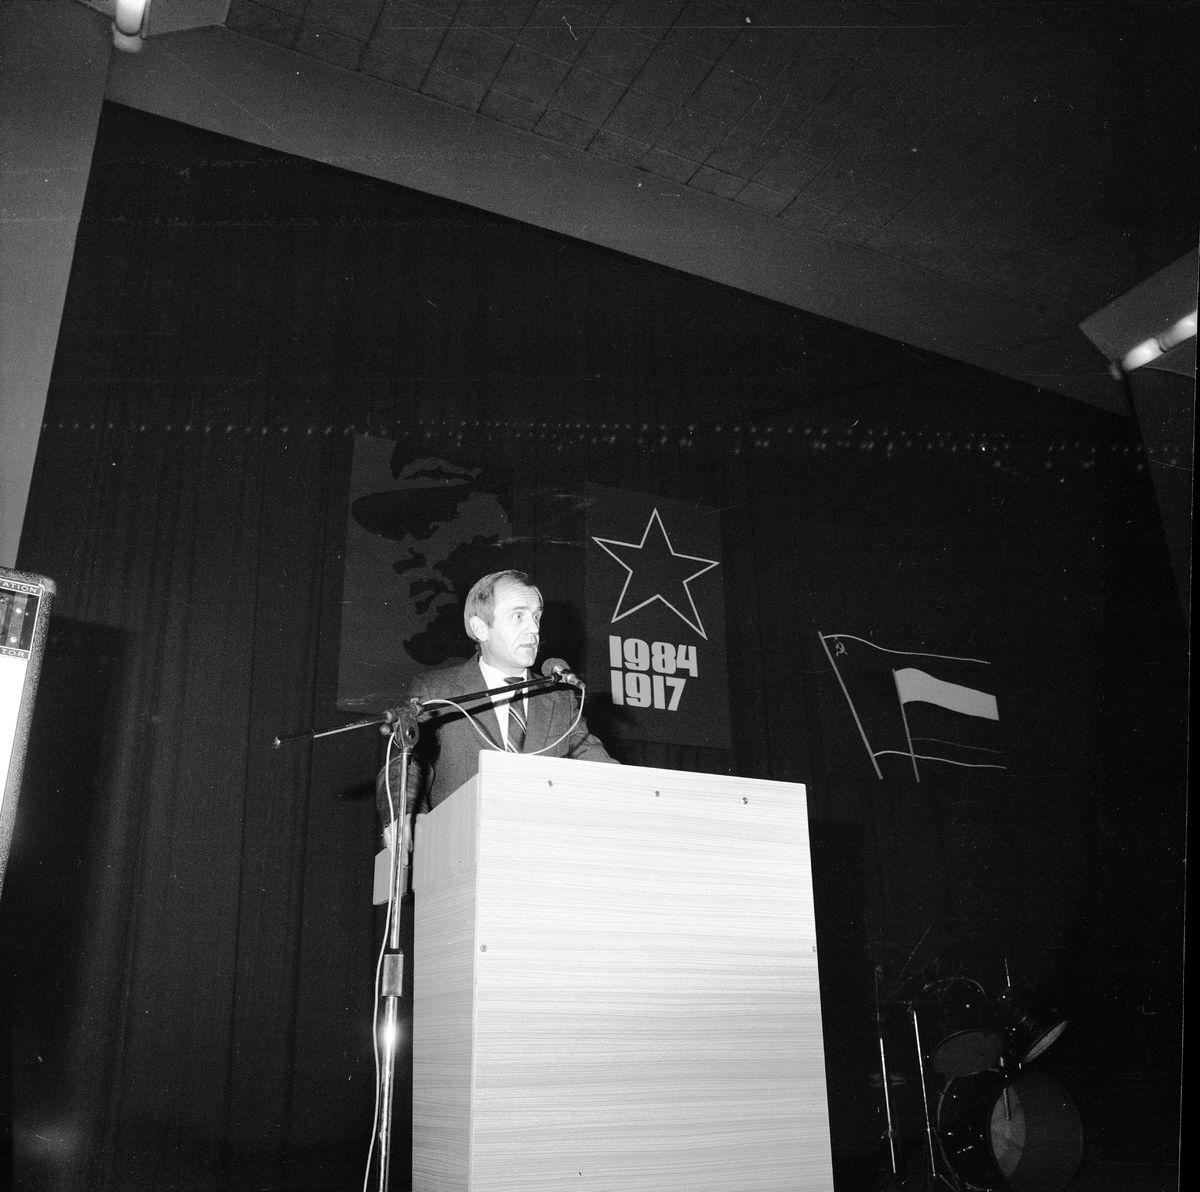 Wizyta konsula ZSRR [1]